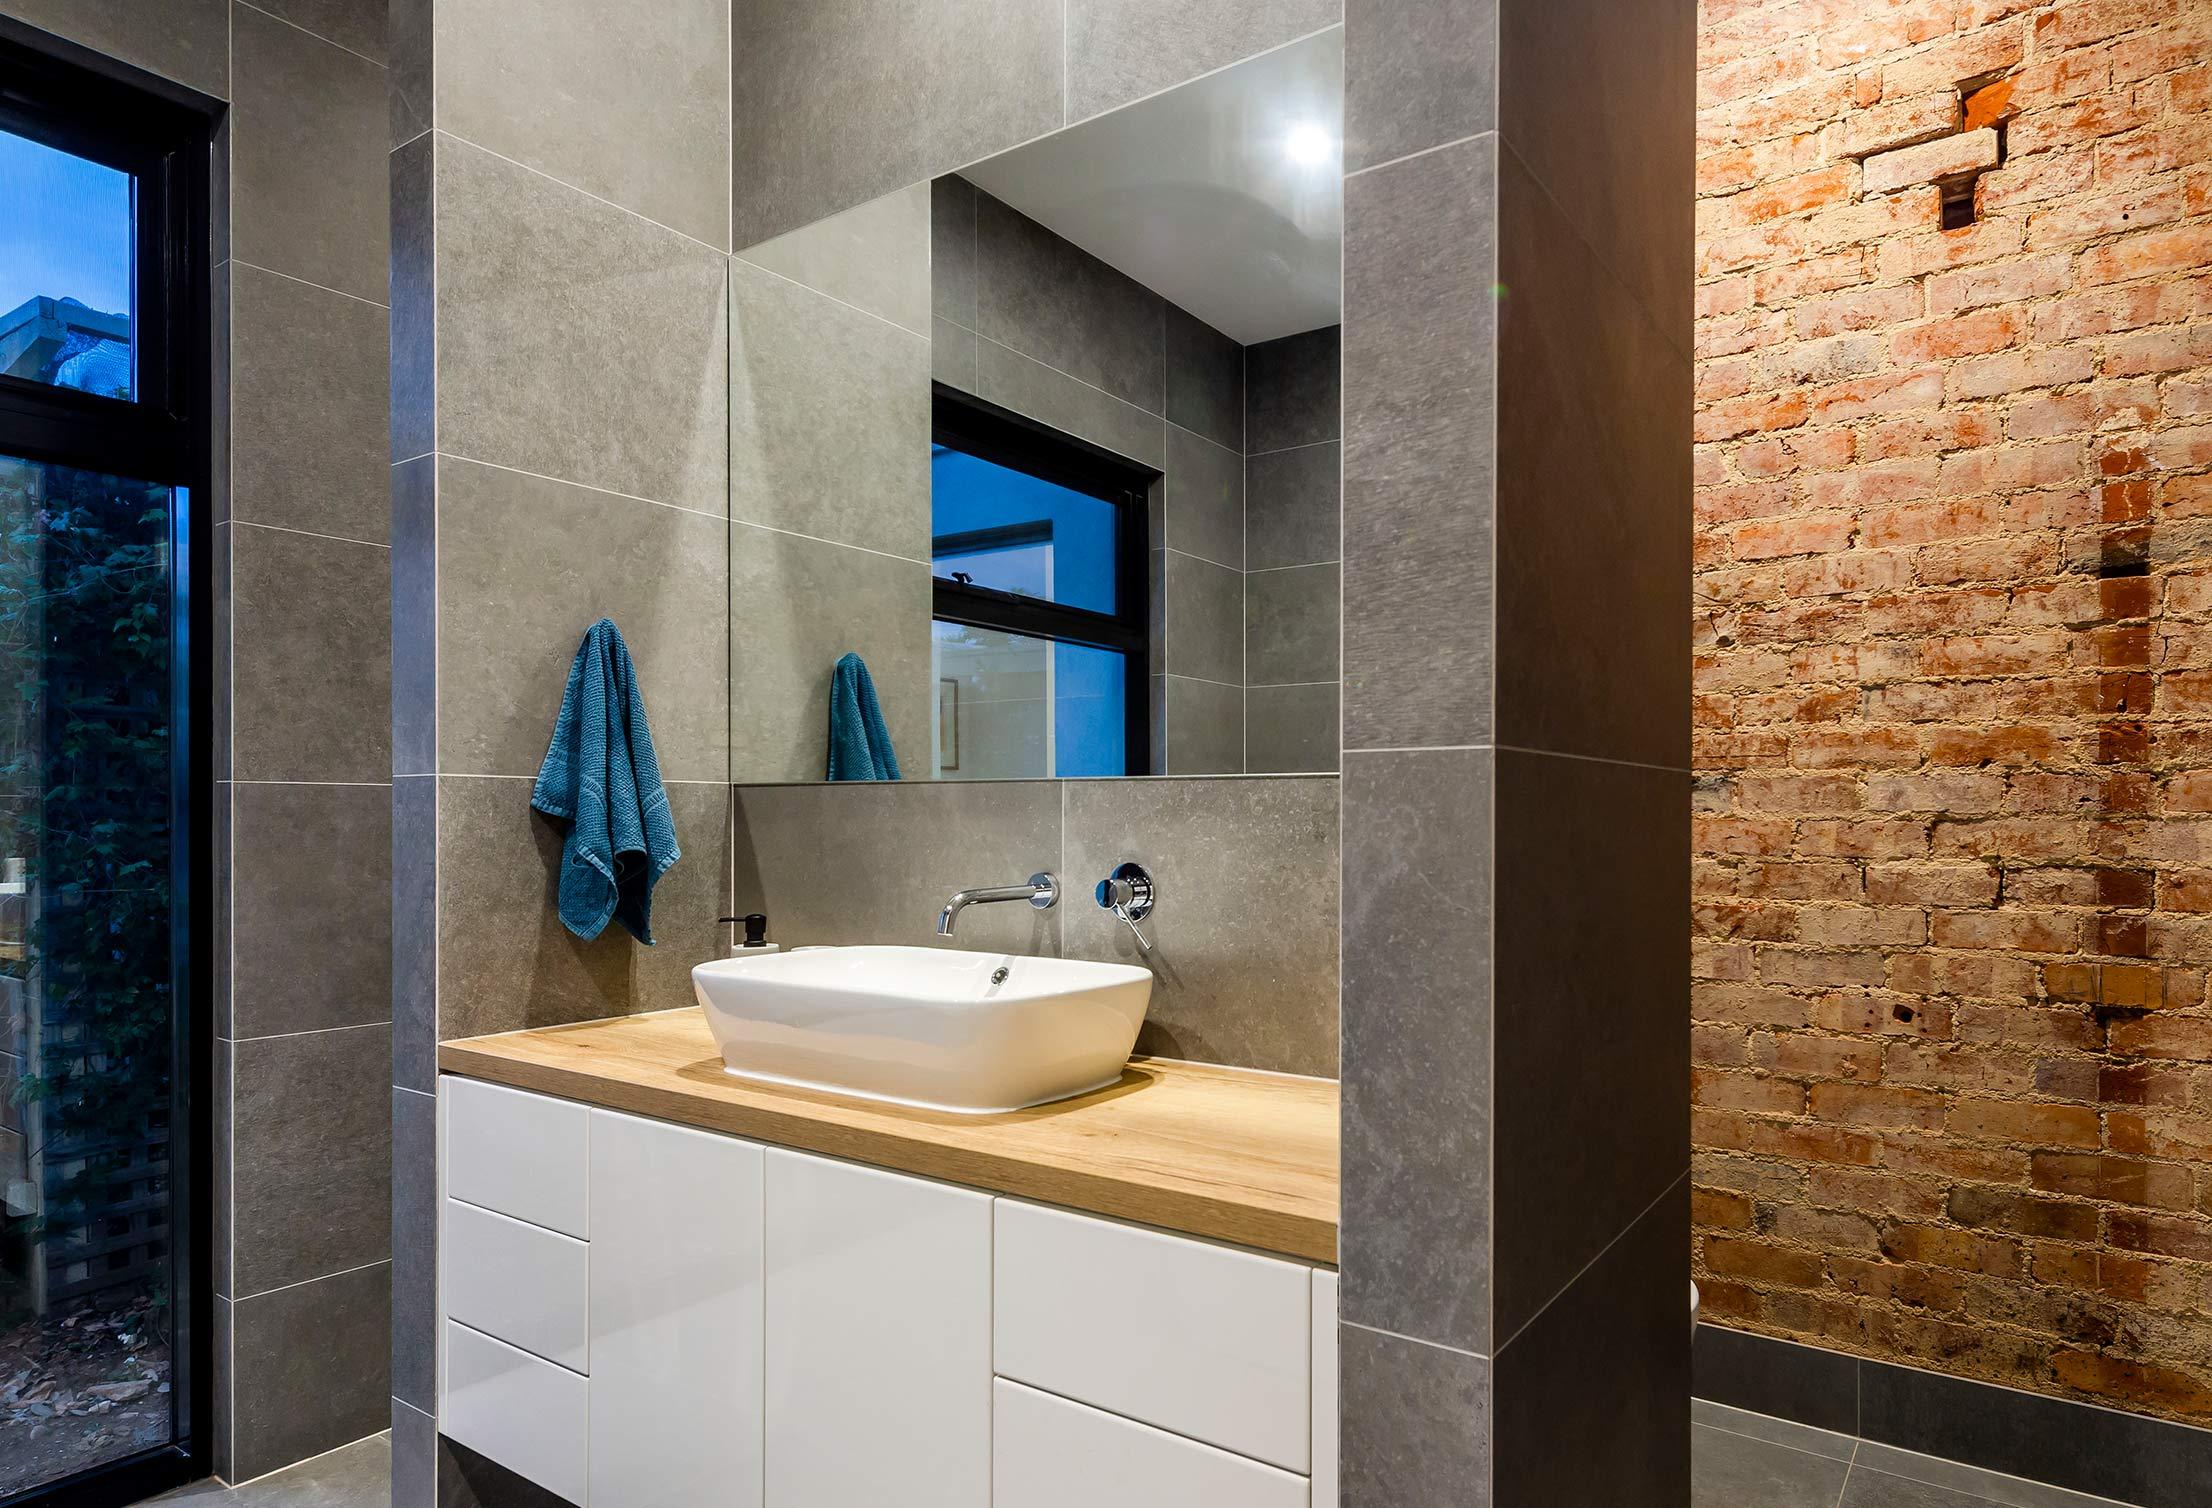 turnbull-built-renovation-bathroom-kings-park-sa.jpg